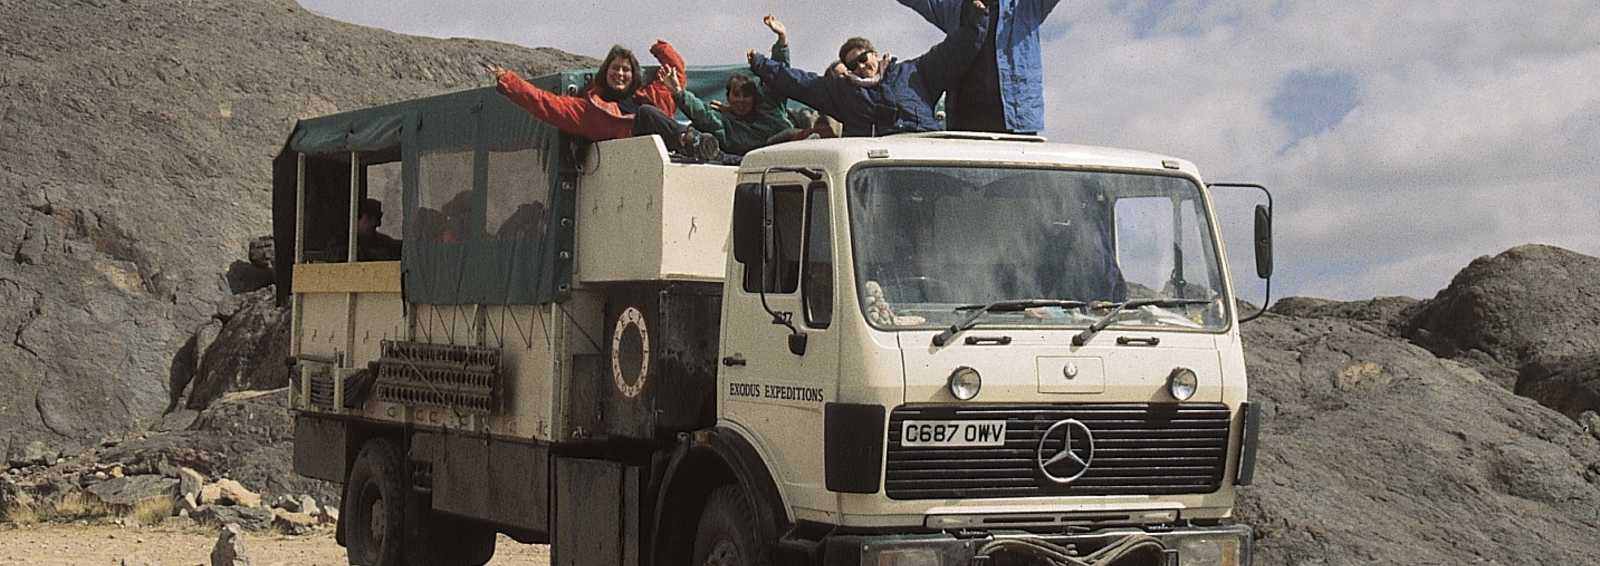 Overland truck in Namib desert, happy clients in 'dog' box